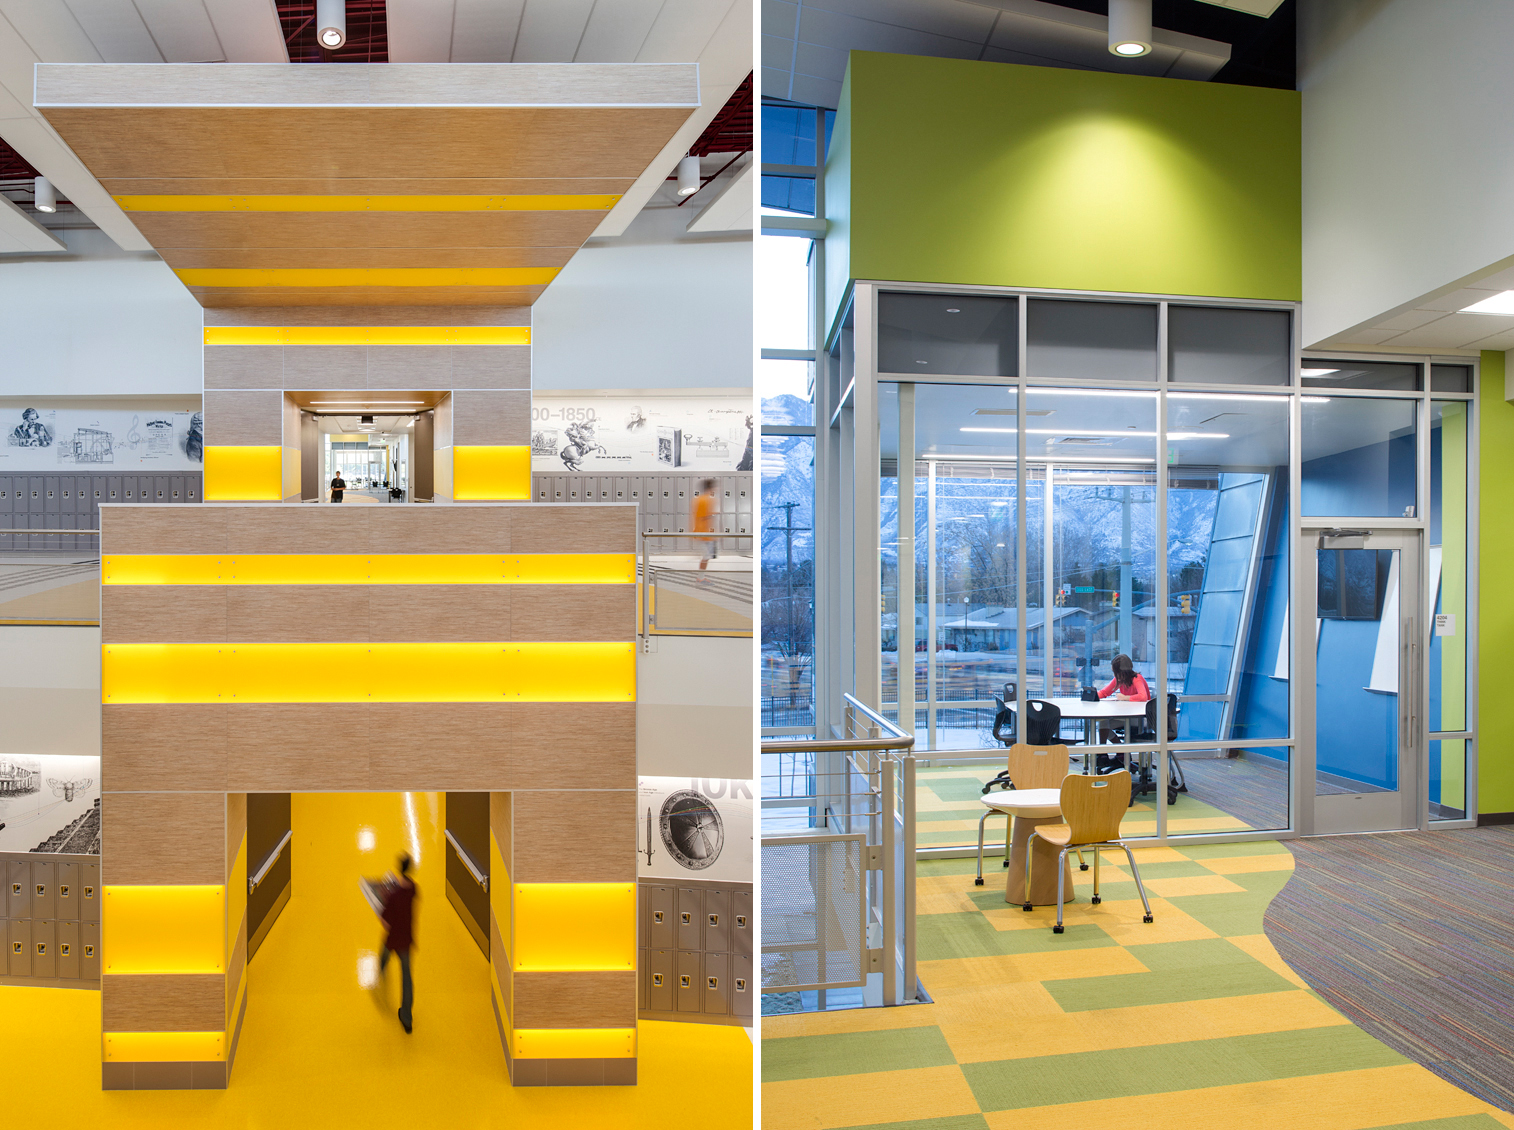 84 Interior Design Schools Montana Schools And Health Programs Will Receive The Brunt Of